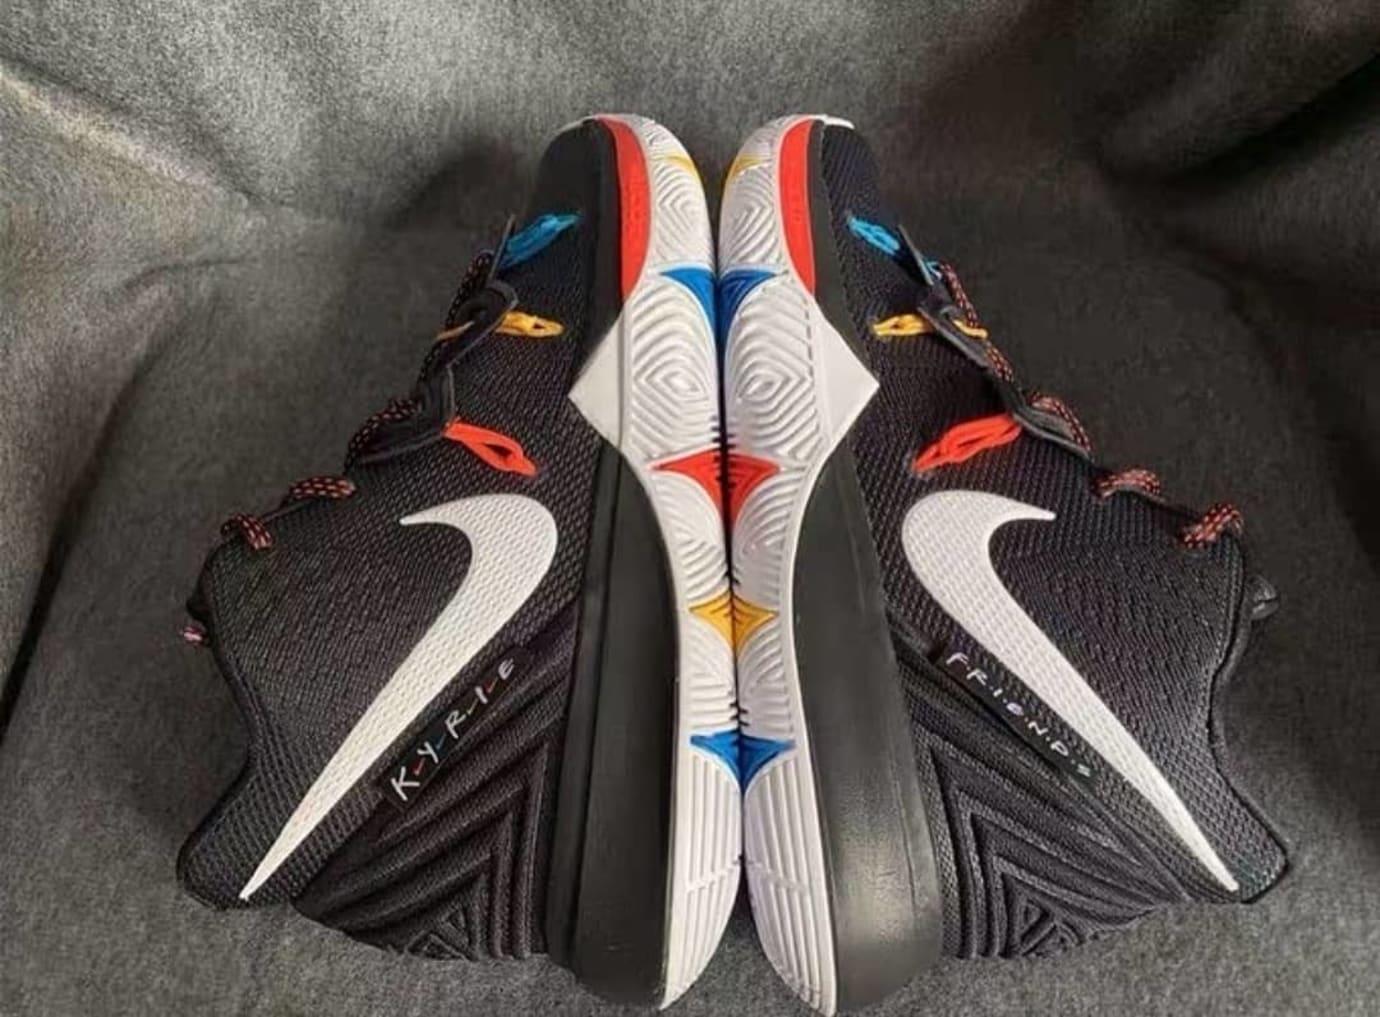 Nike Kyrie 5 'Friends' (Pair) 1